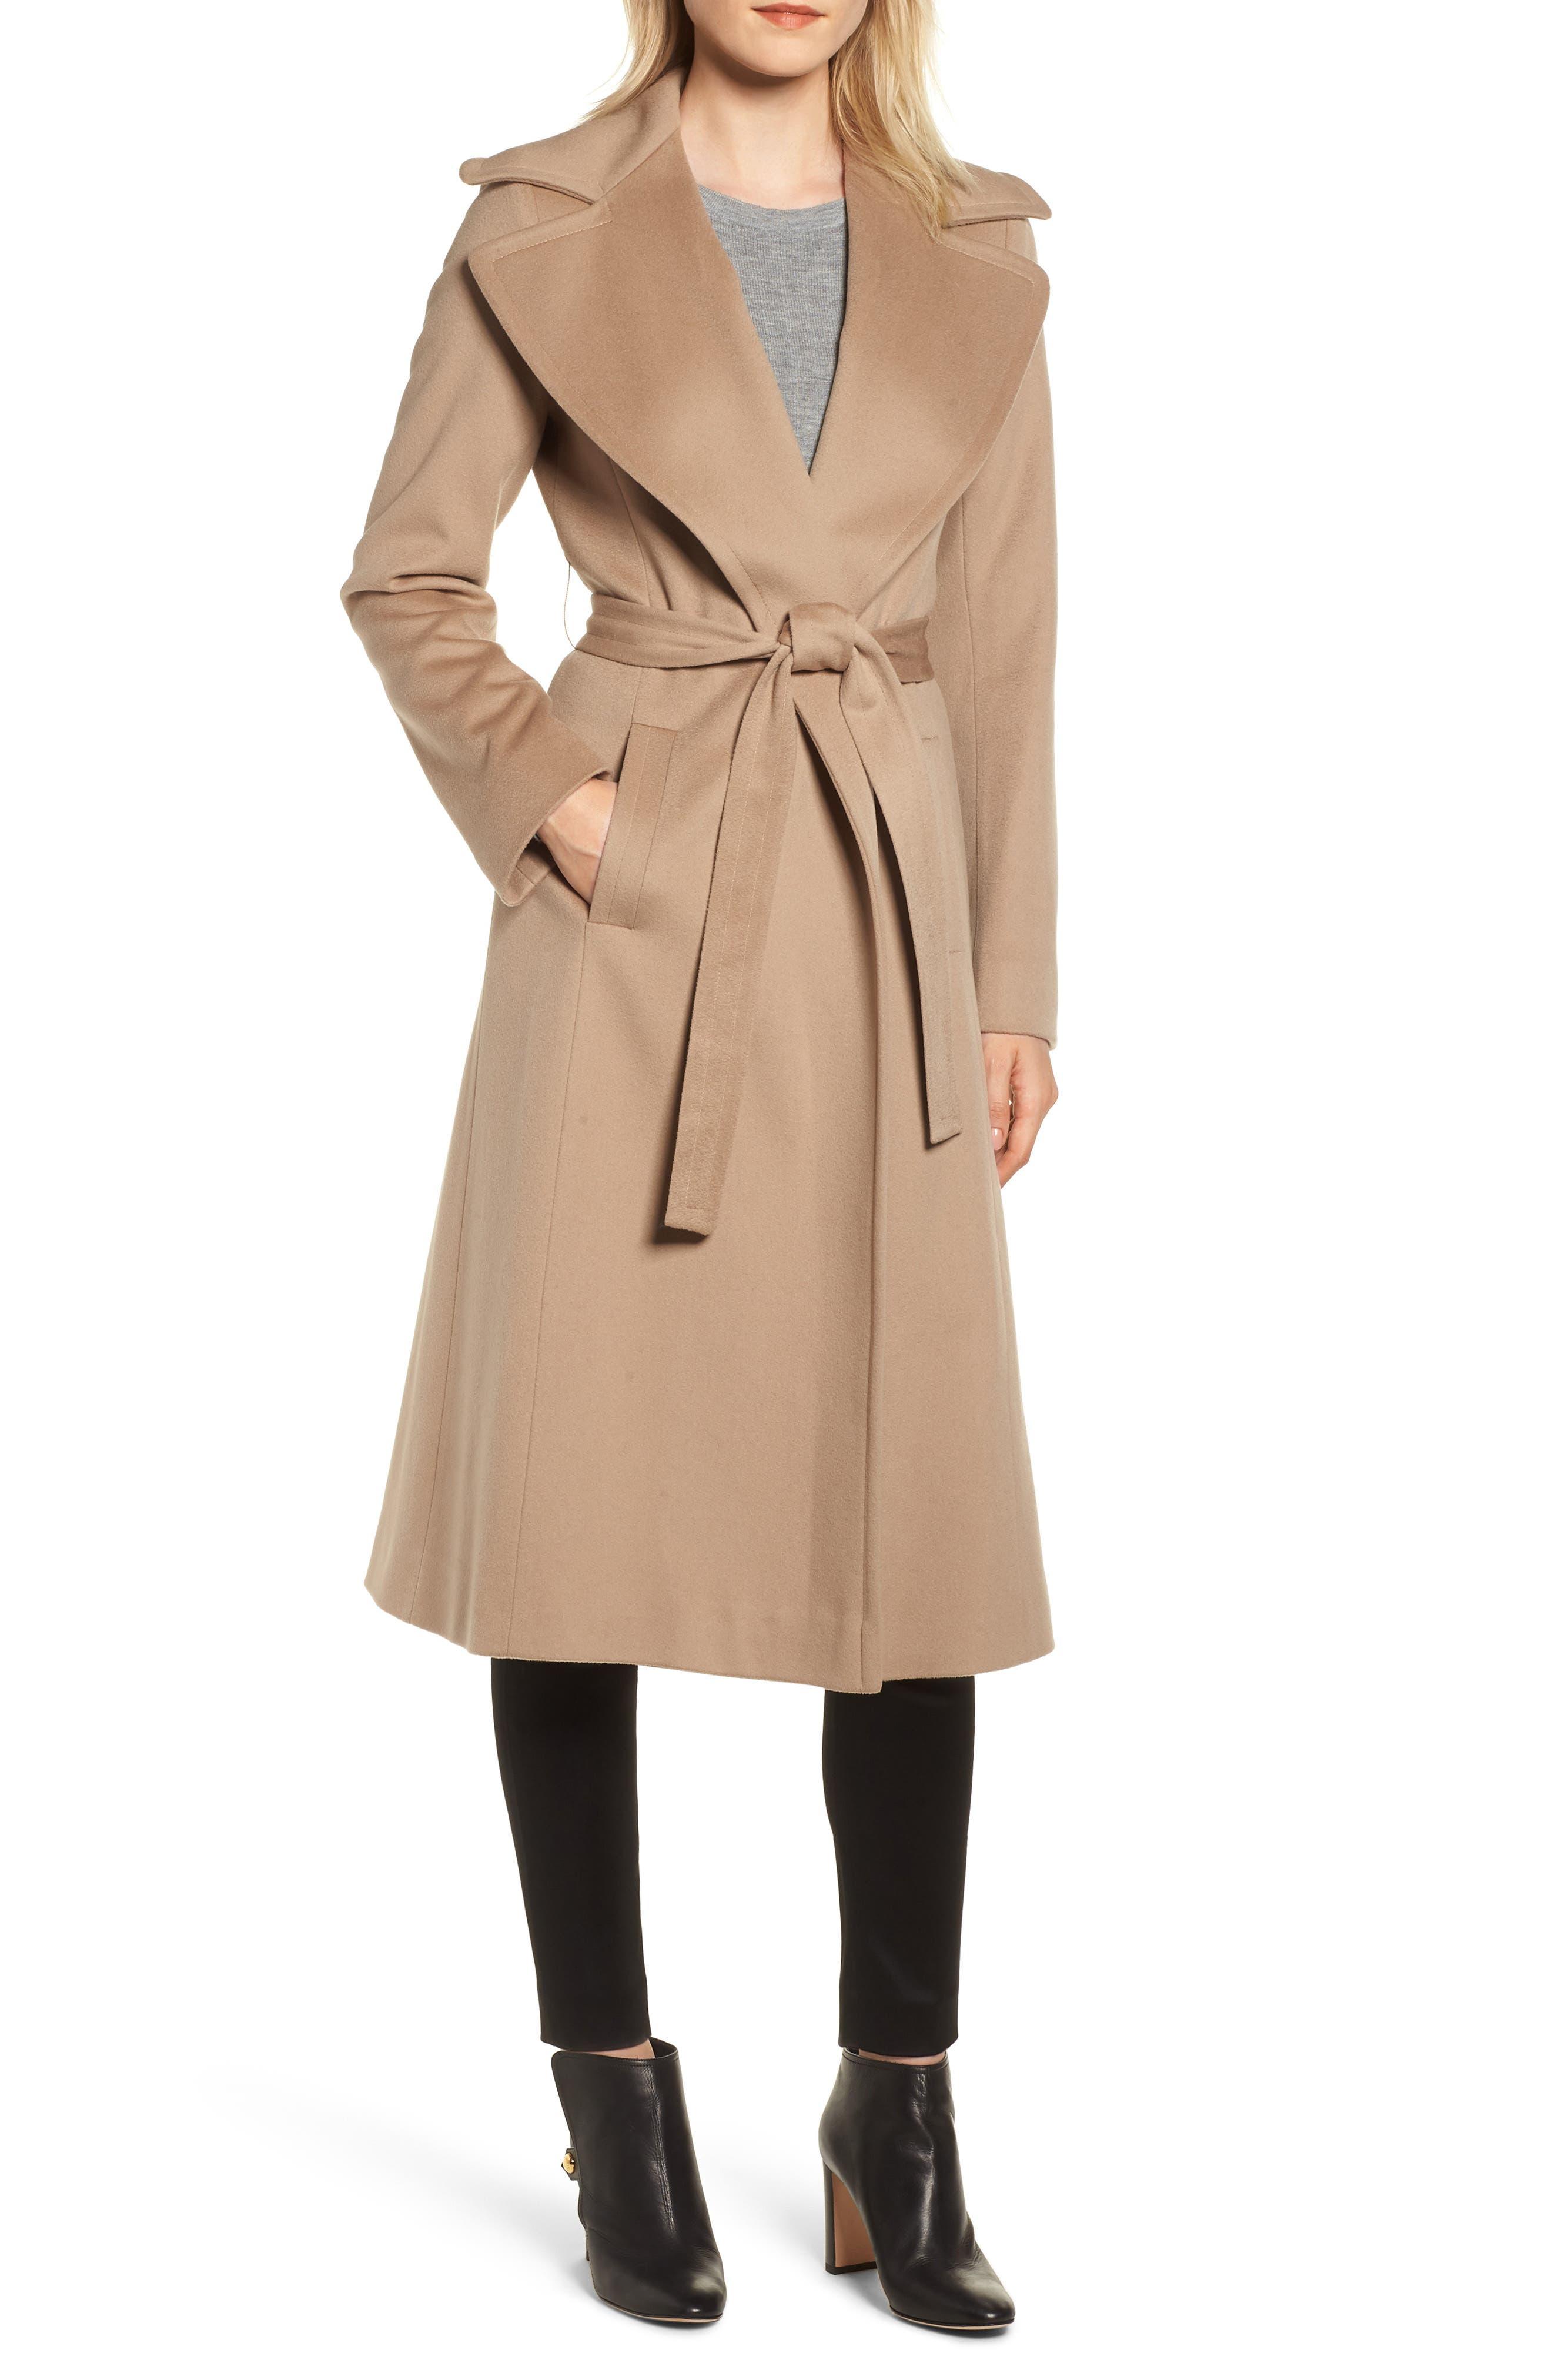 FLEURETTE,                             Loro Piana Wool Wrap Coat,                             Main thumbnail 1, color,                             CAMEL